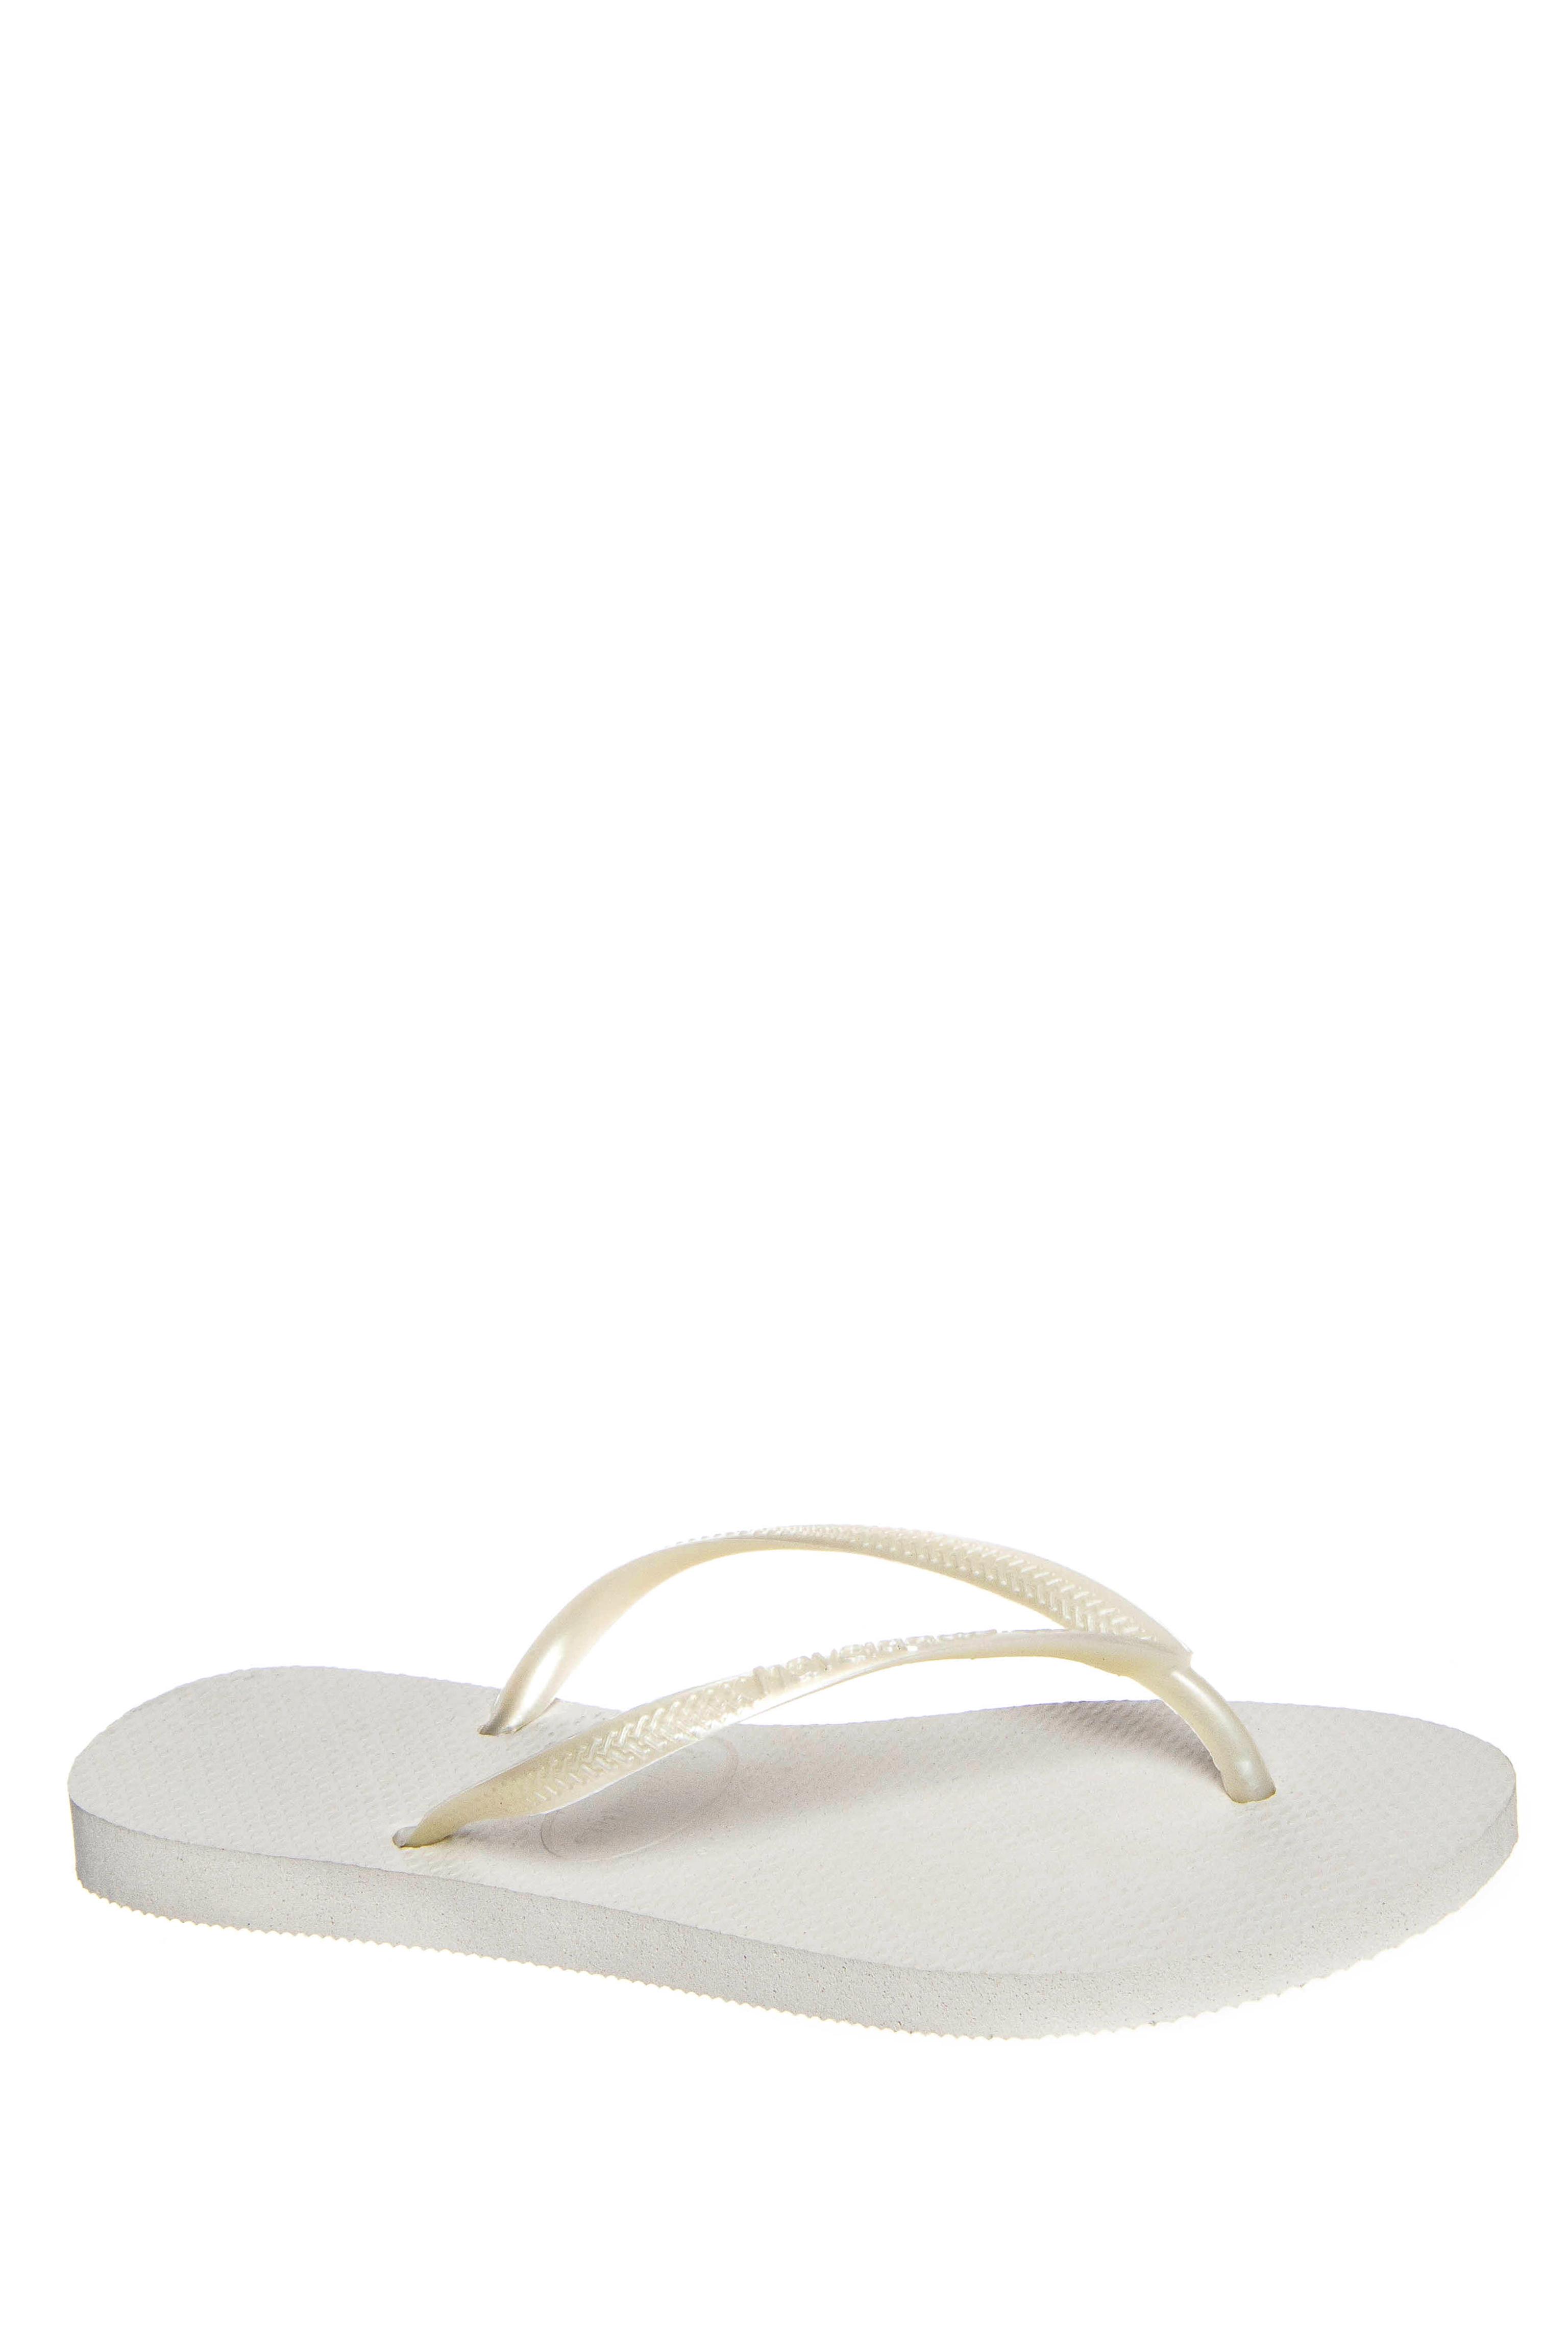 Havaianas Slim Solid Flip Flops - White